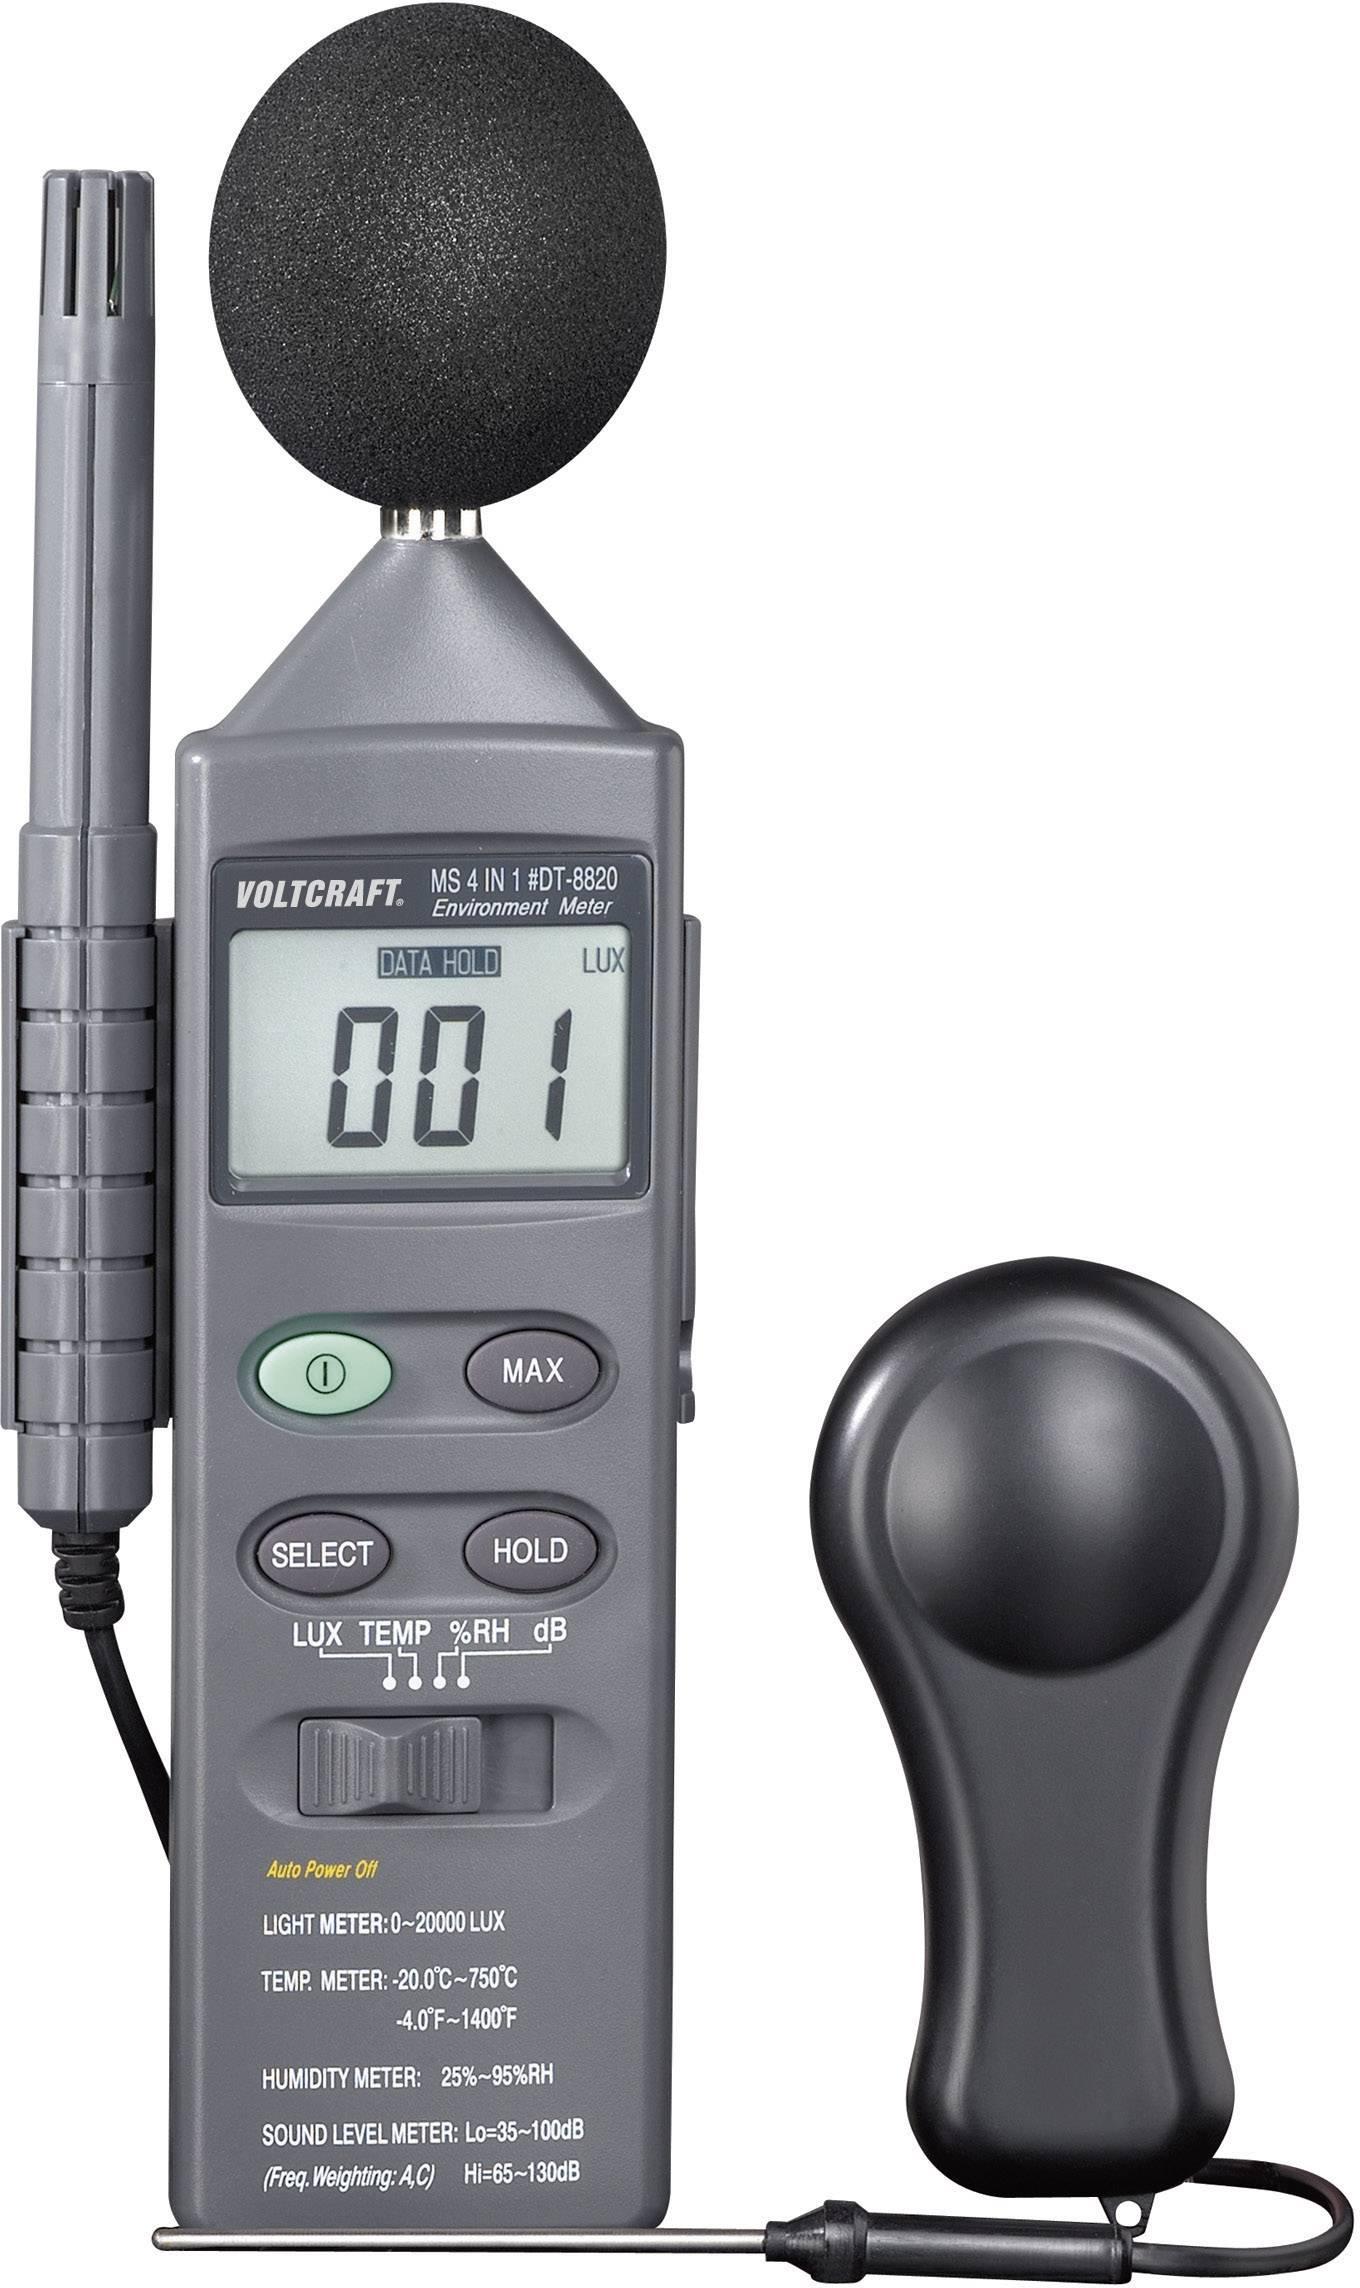 VOLTCRAFT DT 8820 Termometro -